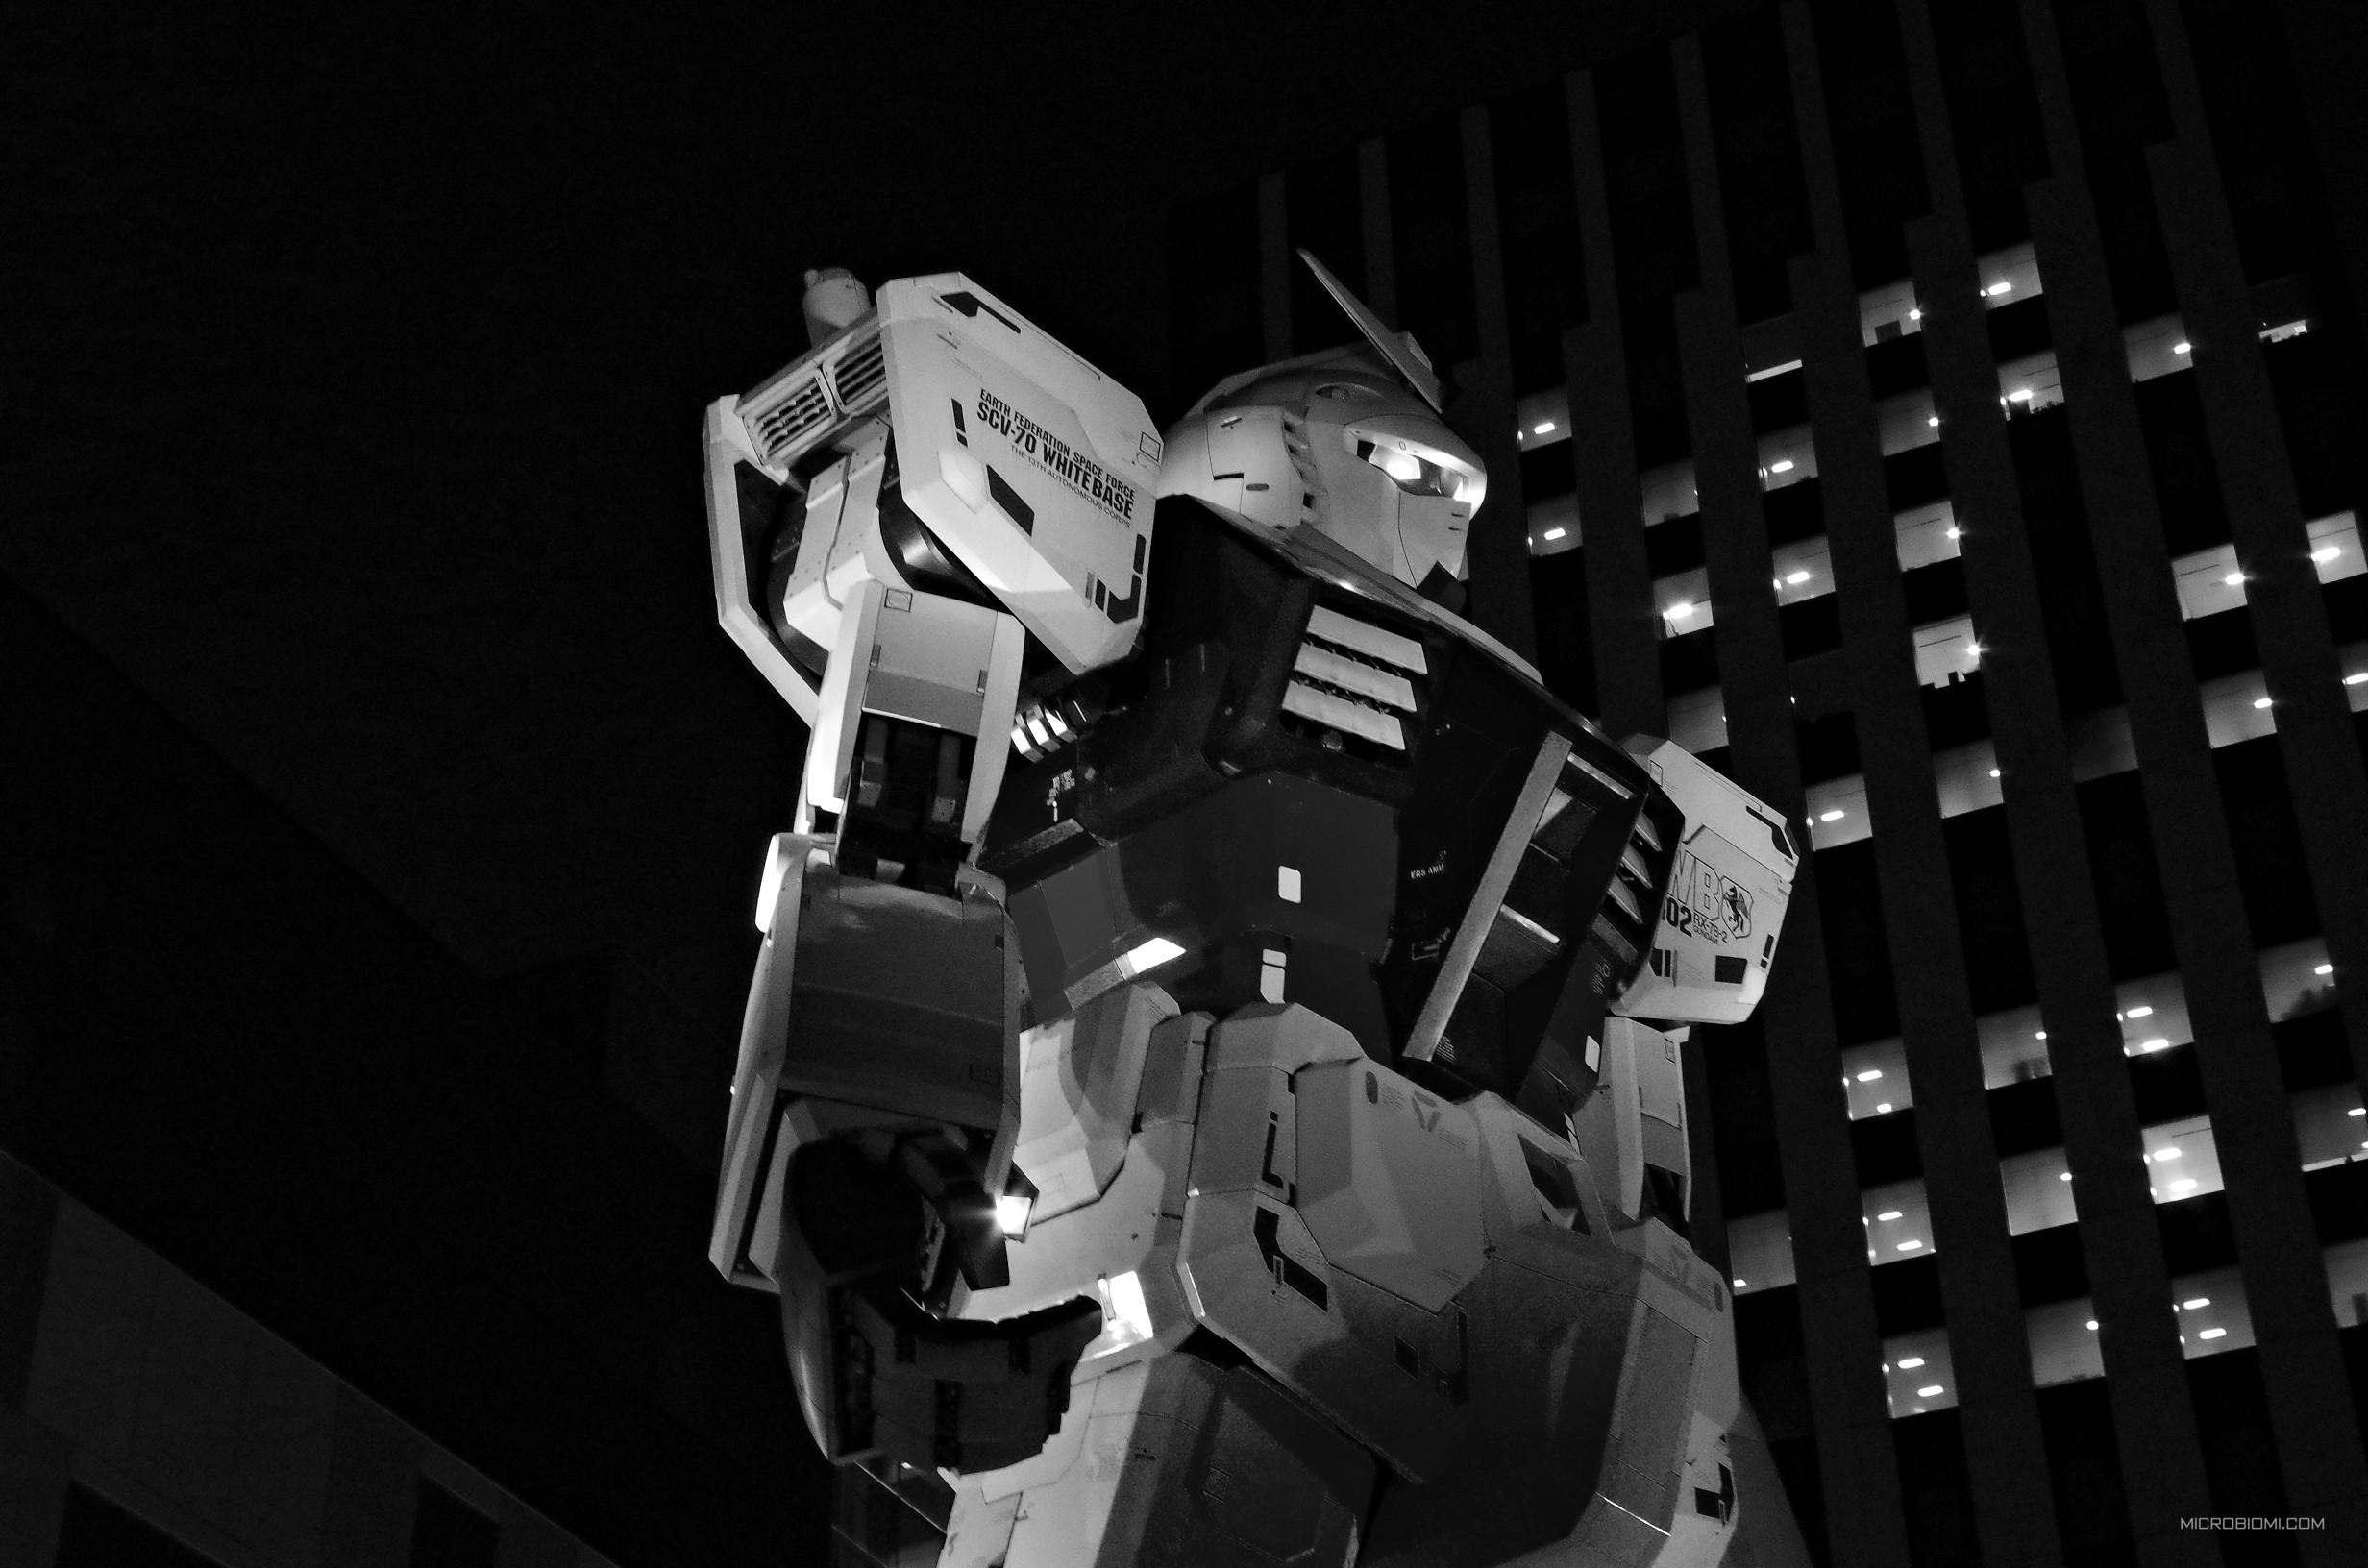 La statua di Gundam RX-78-2 a Tokyo - Odaiba. Ora è stata sostituita da una ancora più grande, raffigurante Unicorn Gundam